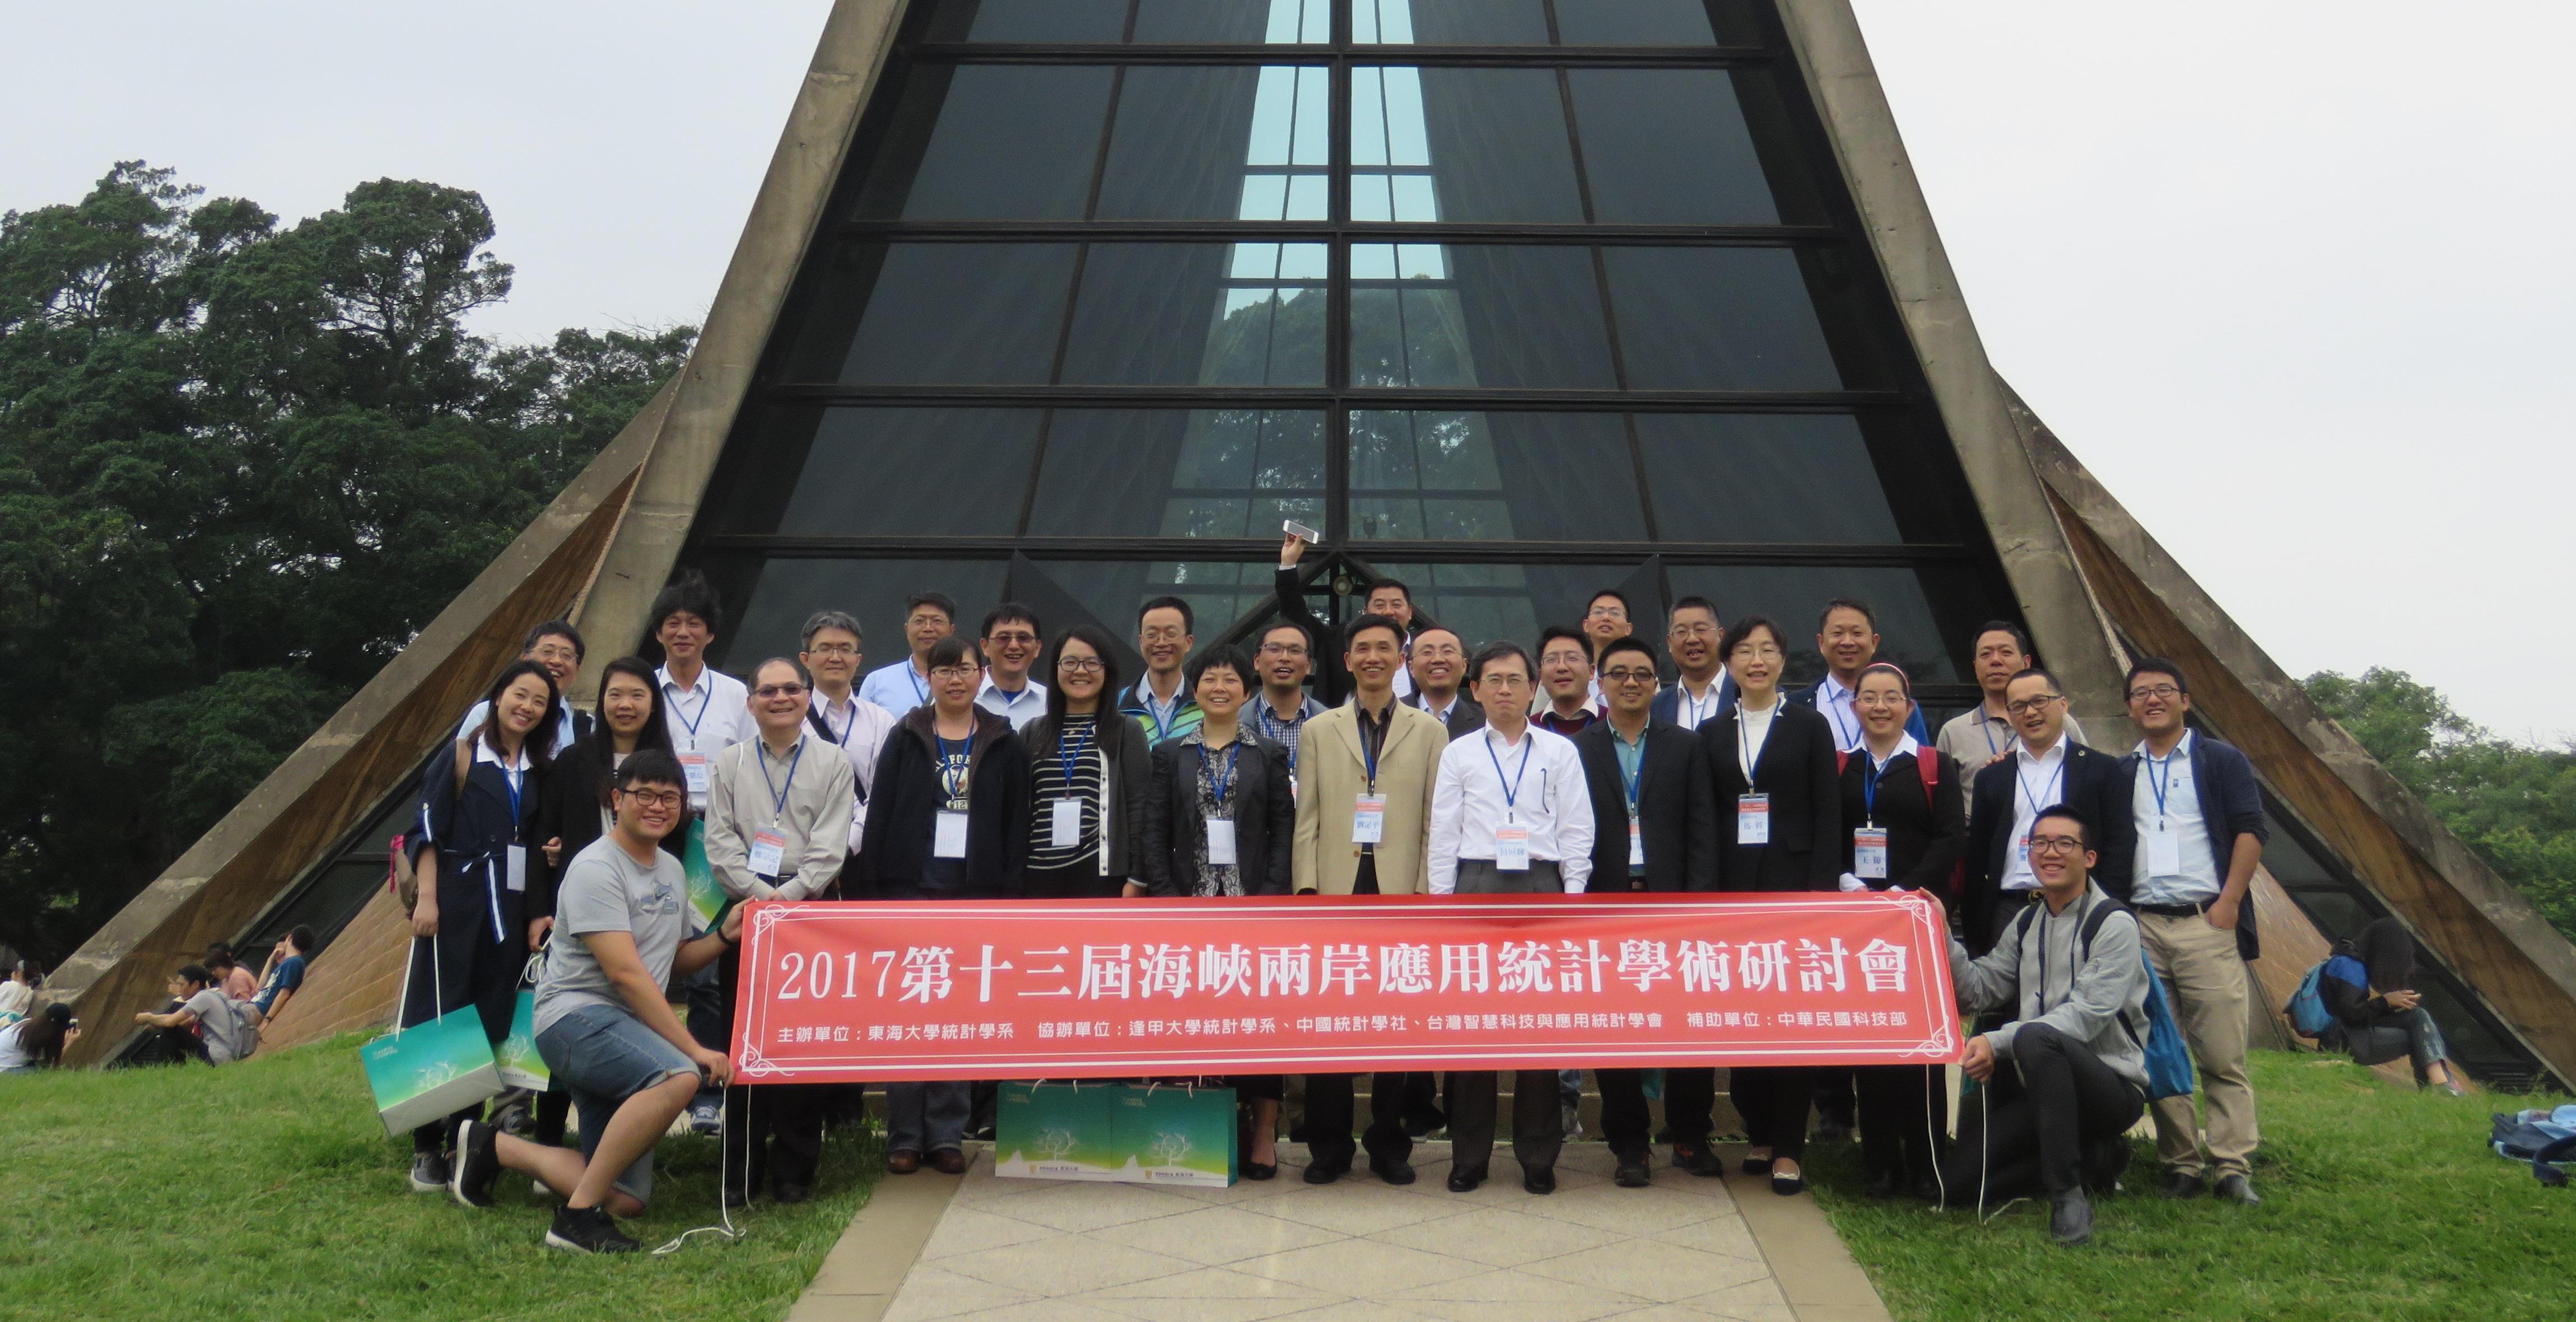 2017 Cross-Strait Application Statistics Seminar